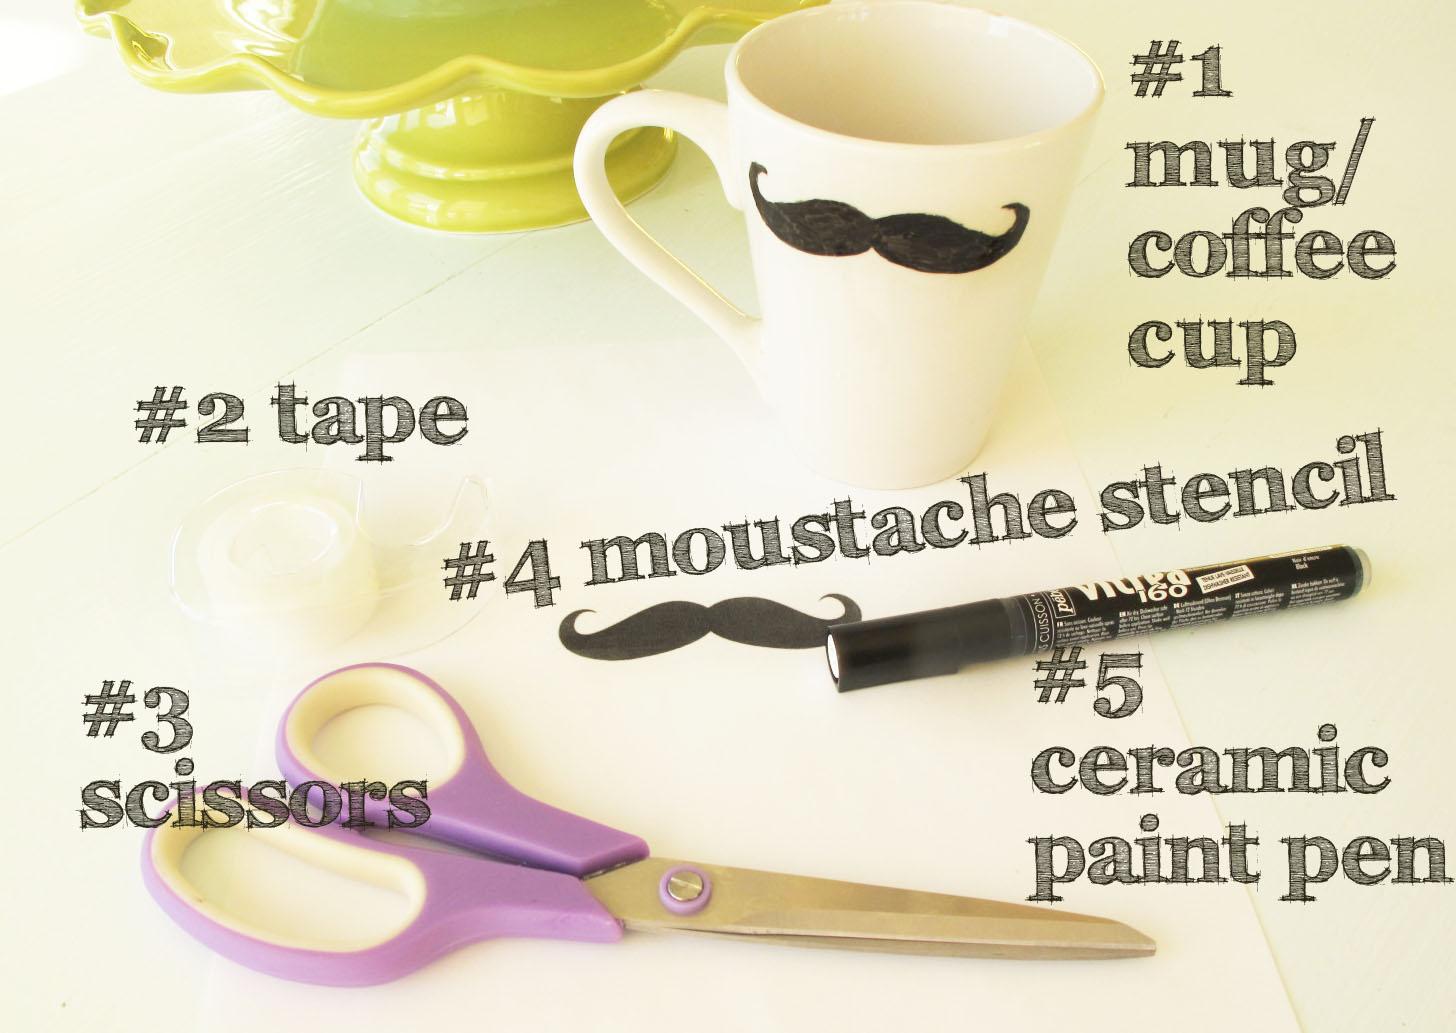 DIY GIFT IDEA moustache mug kandeej.com Last Minute Osterspecial | DIY Ostergeschenke zum Selbermachen